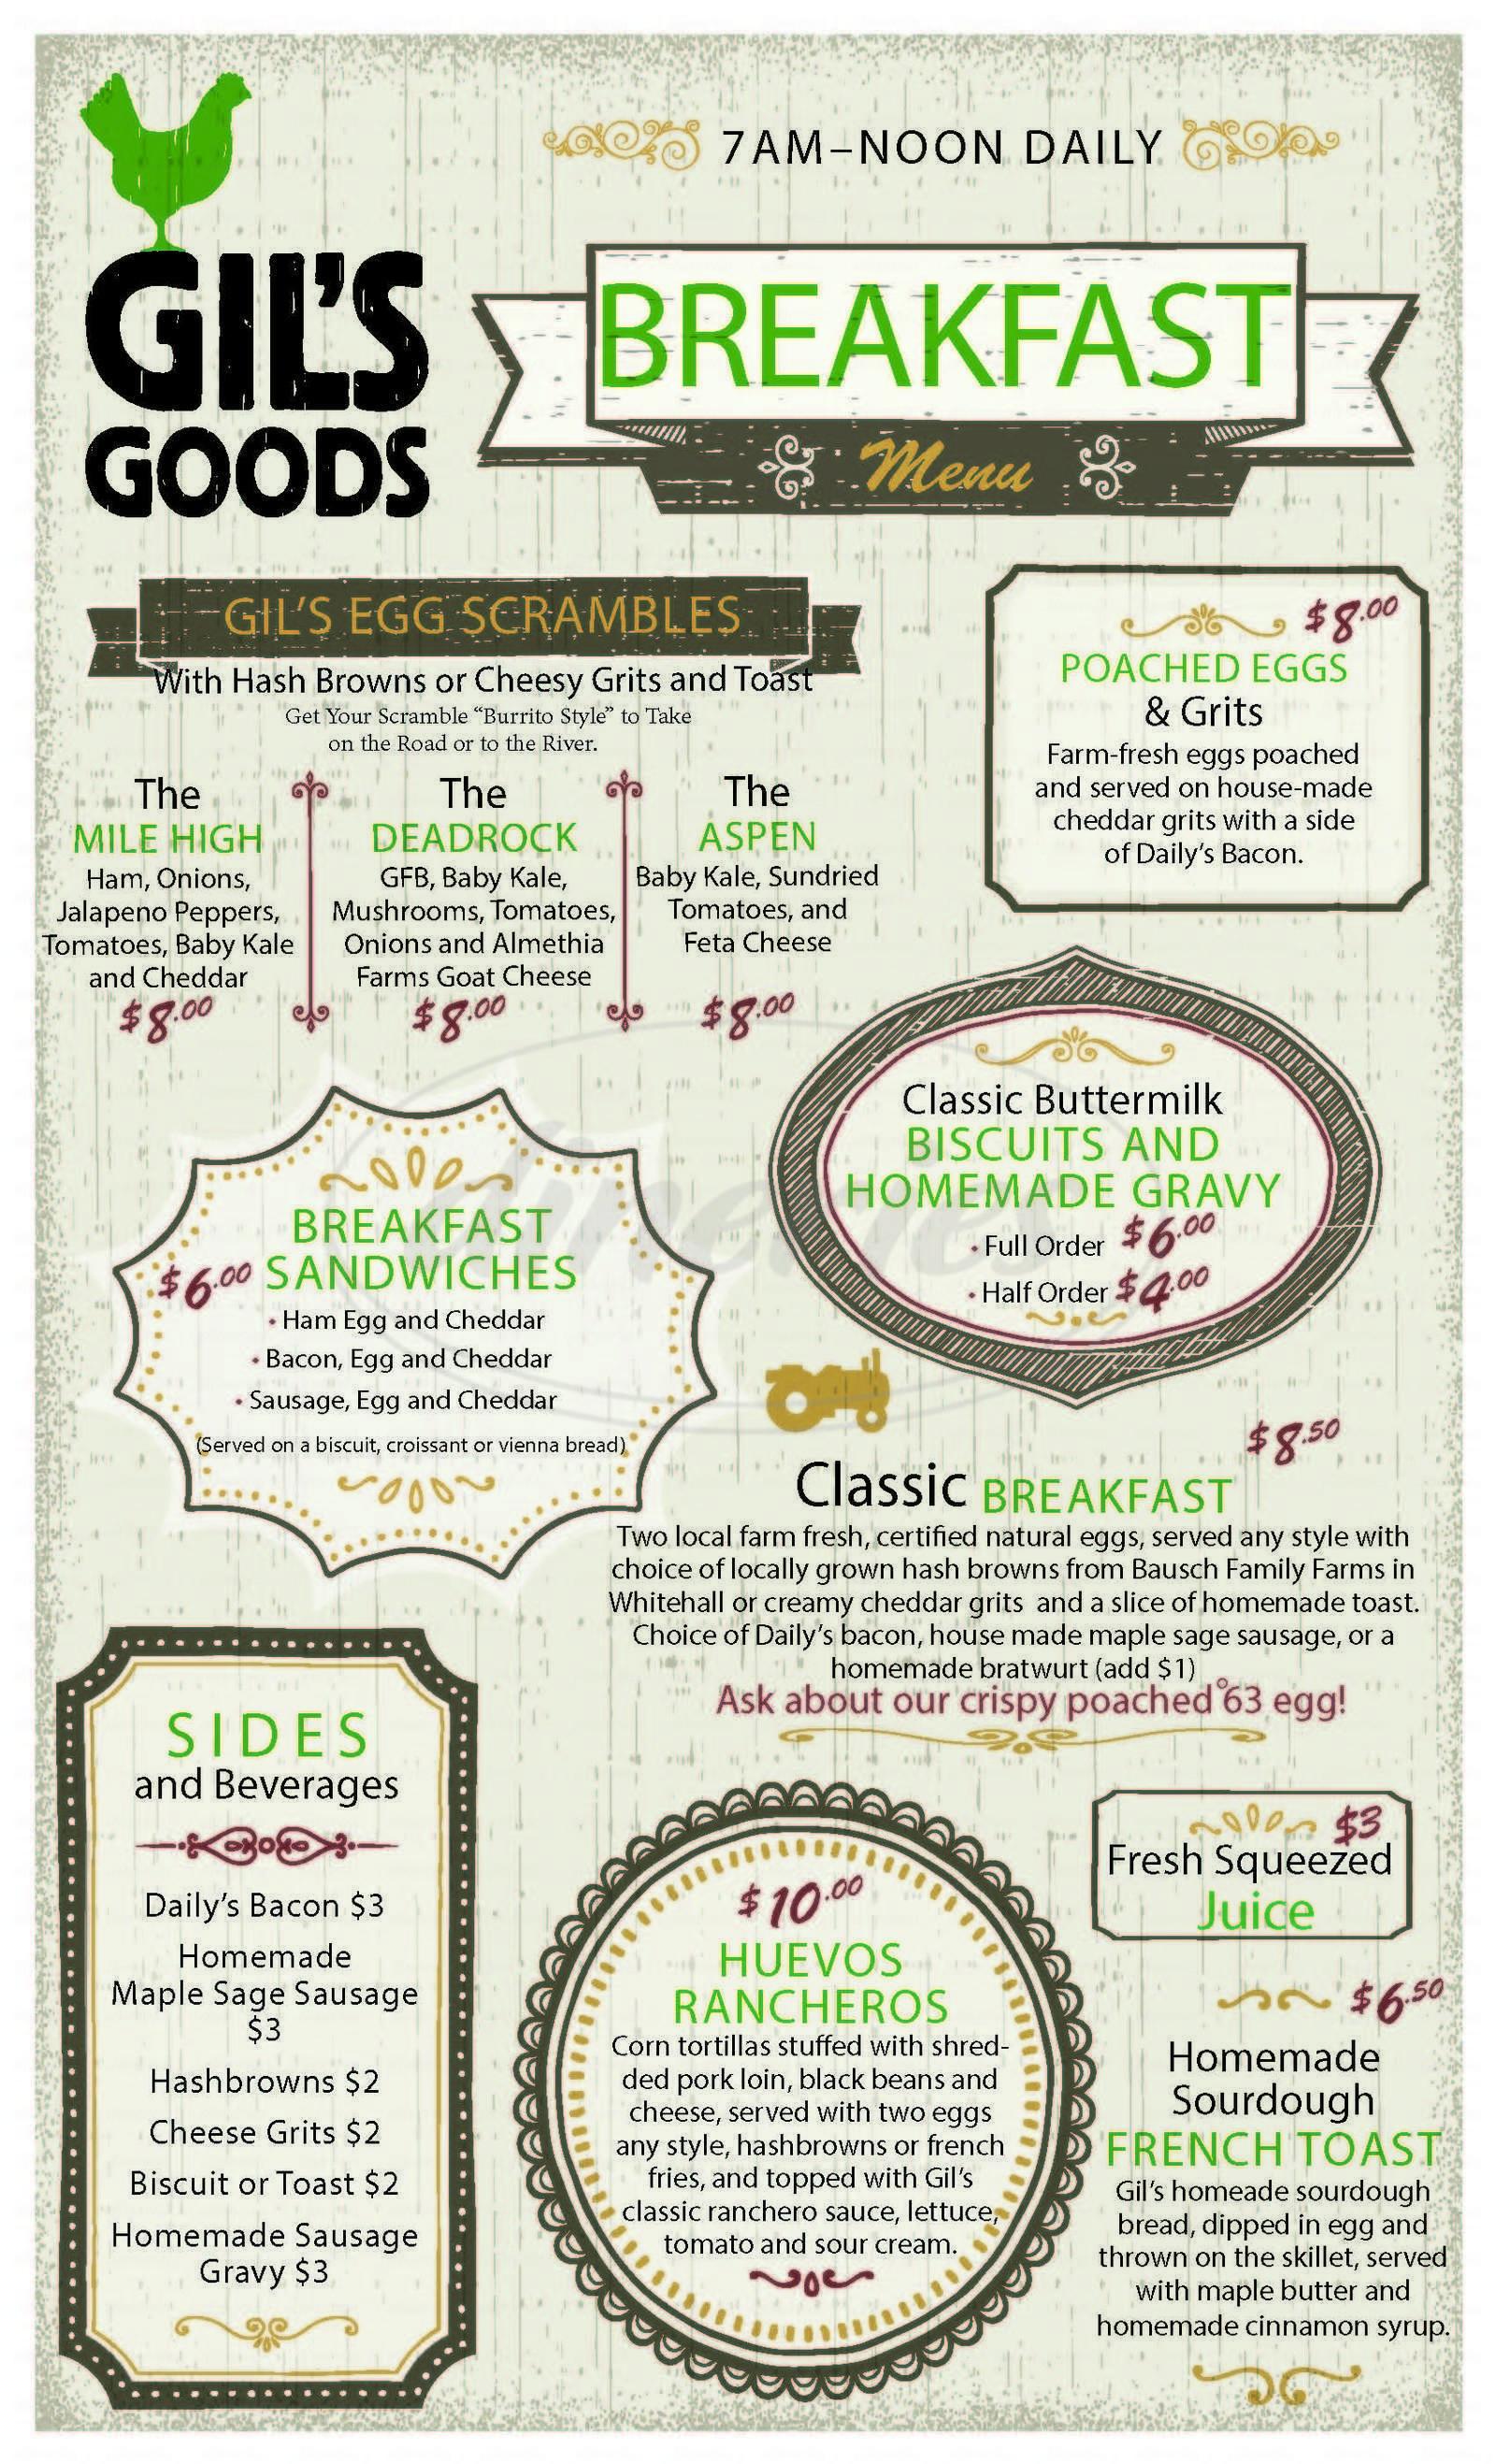 menu for Gil's Goods